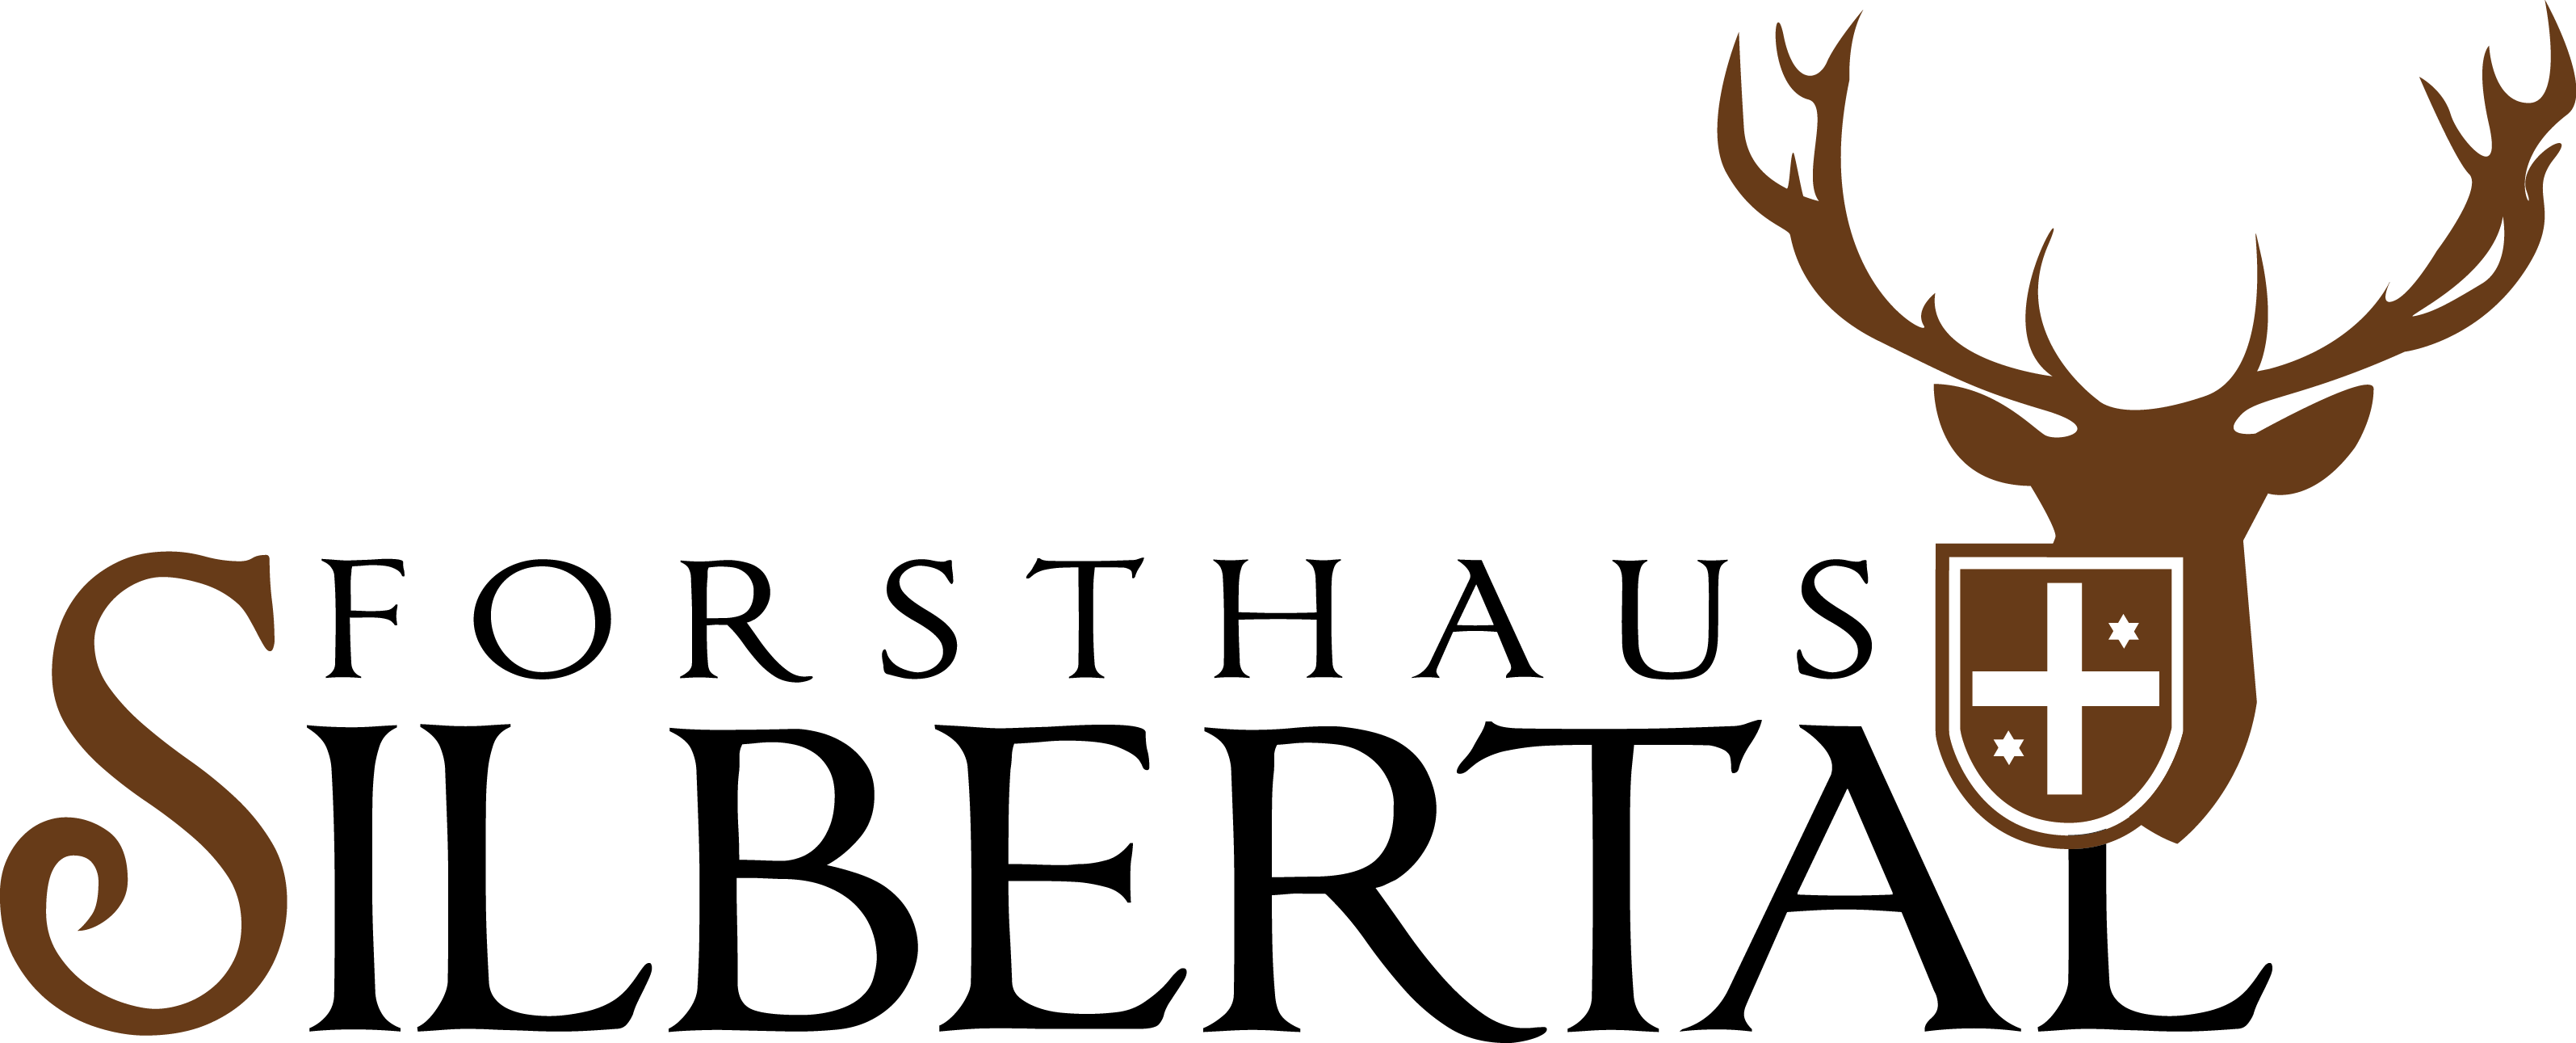 Forsthaus Silbertal Logo